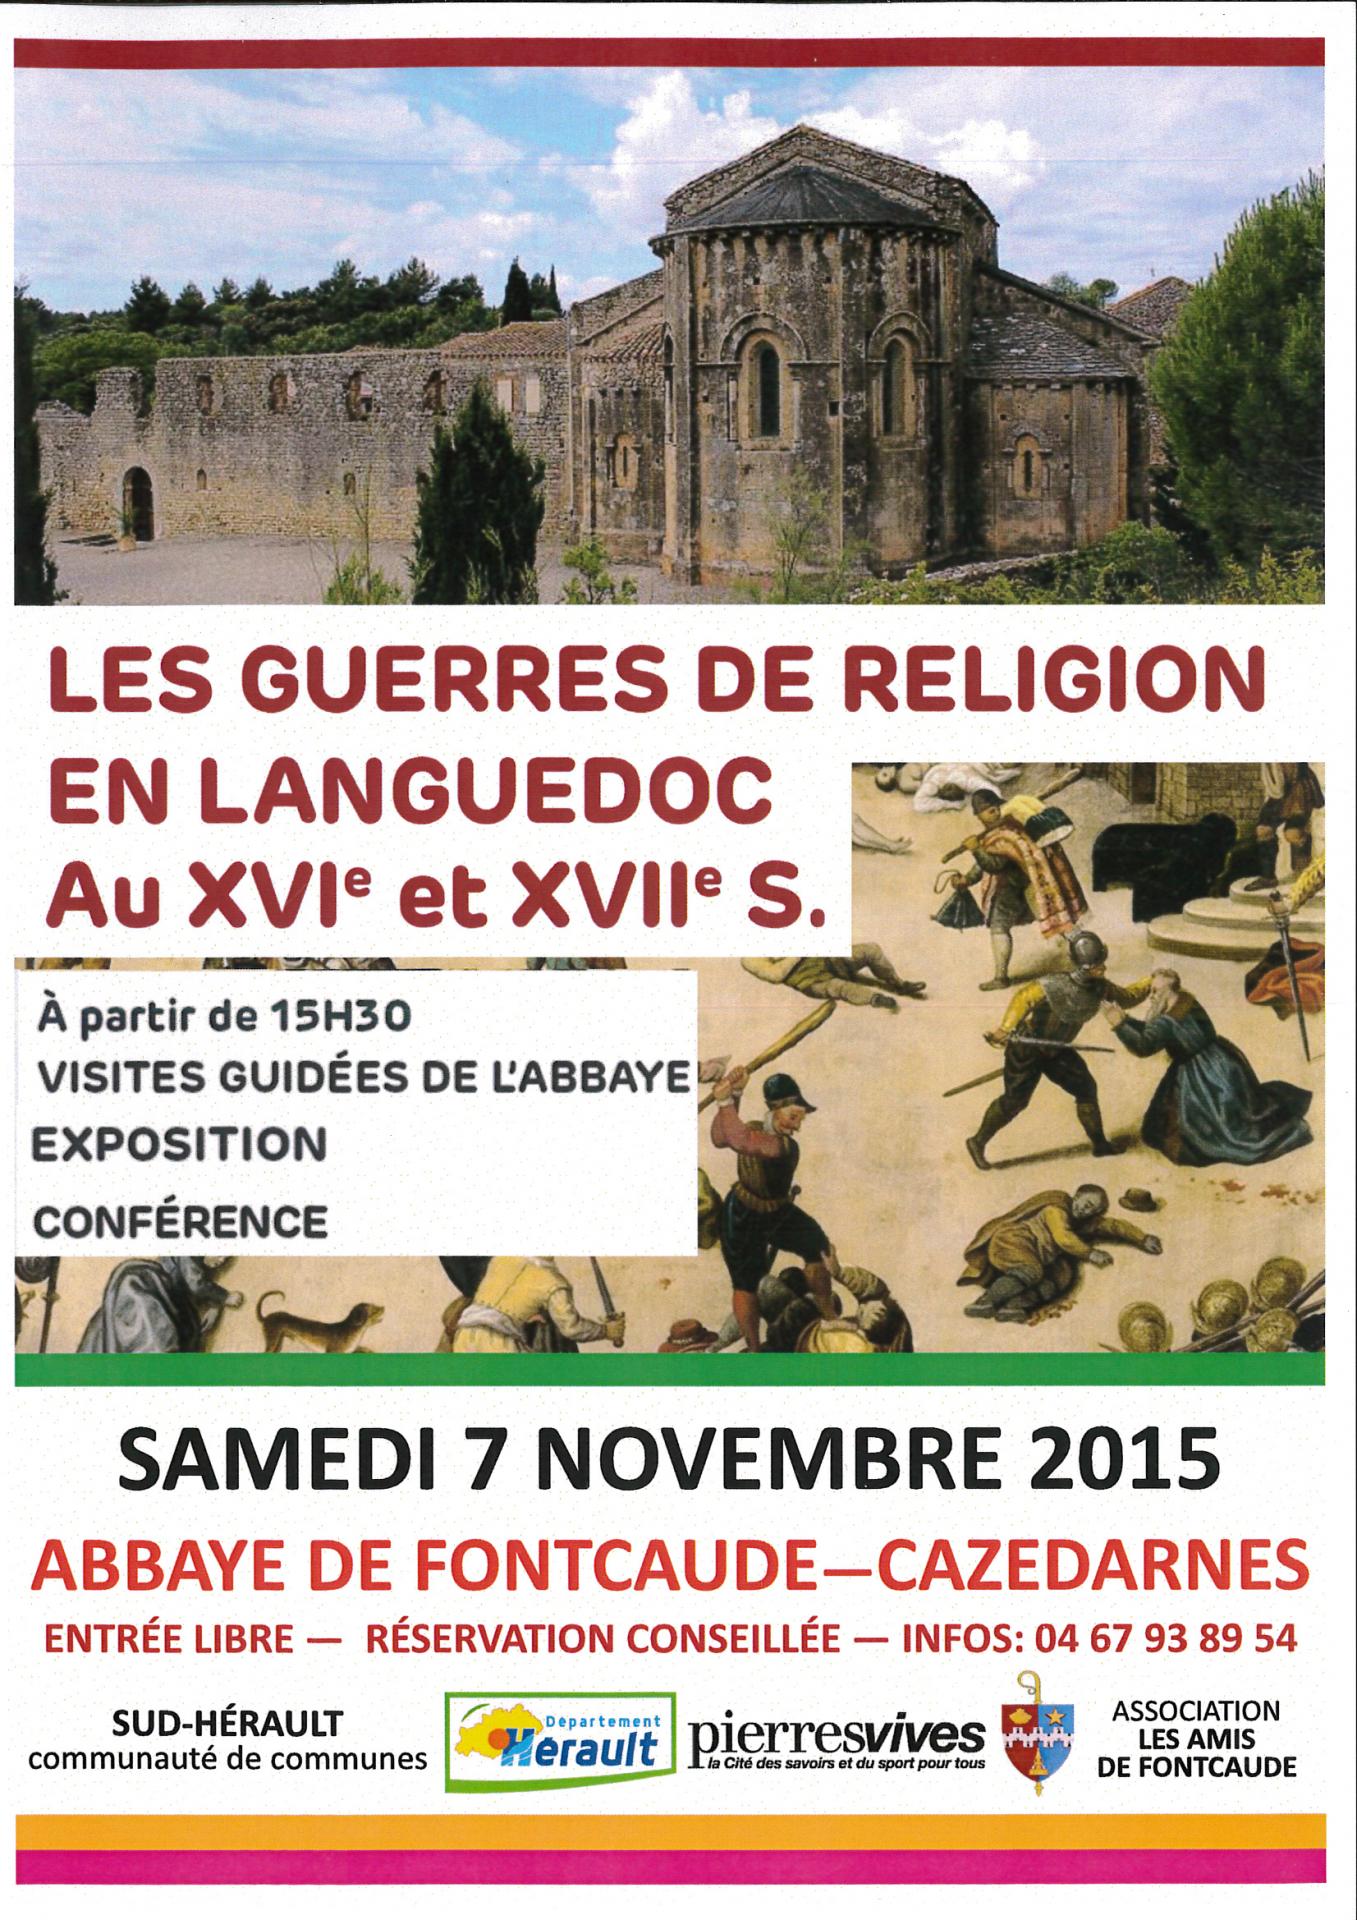 2015 11 07 conference abbaye de fontcaude